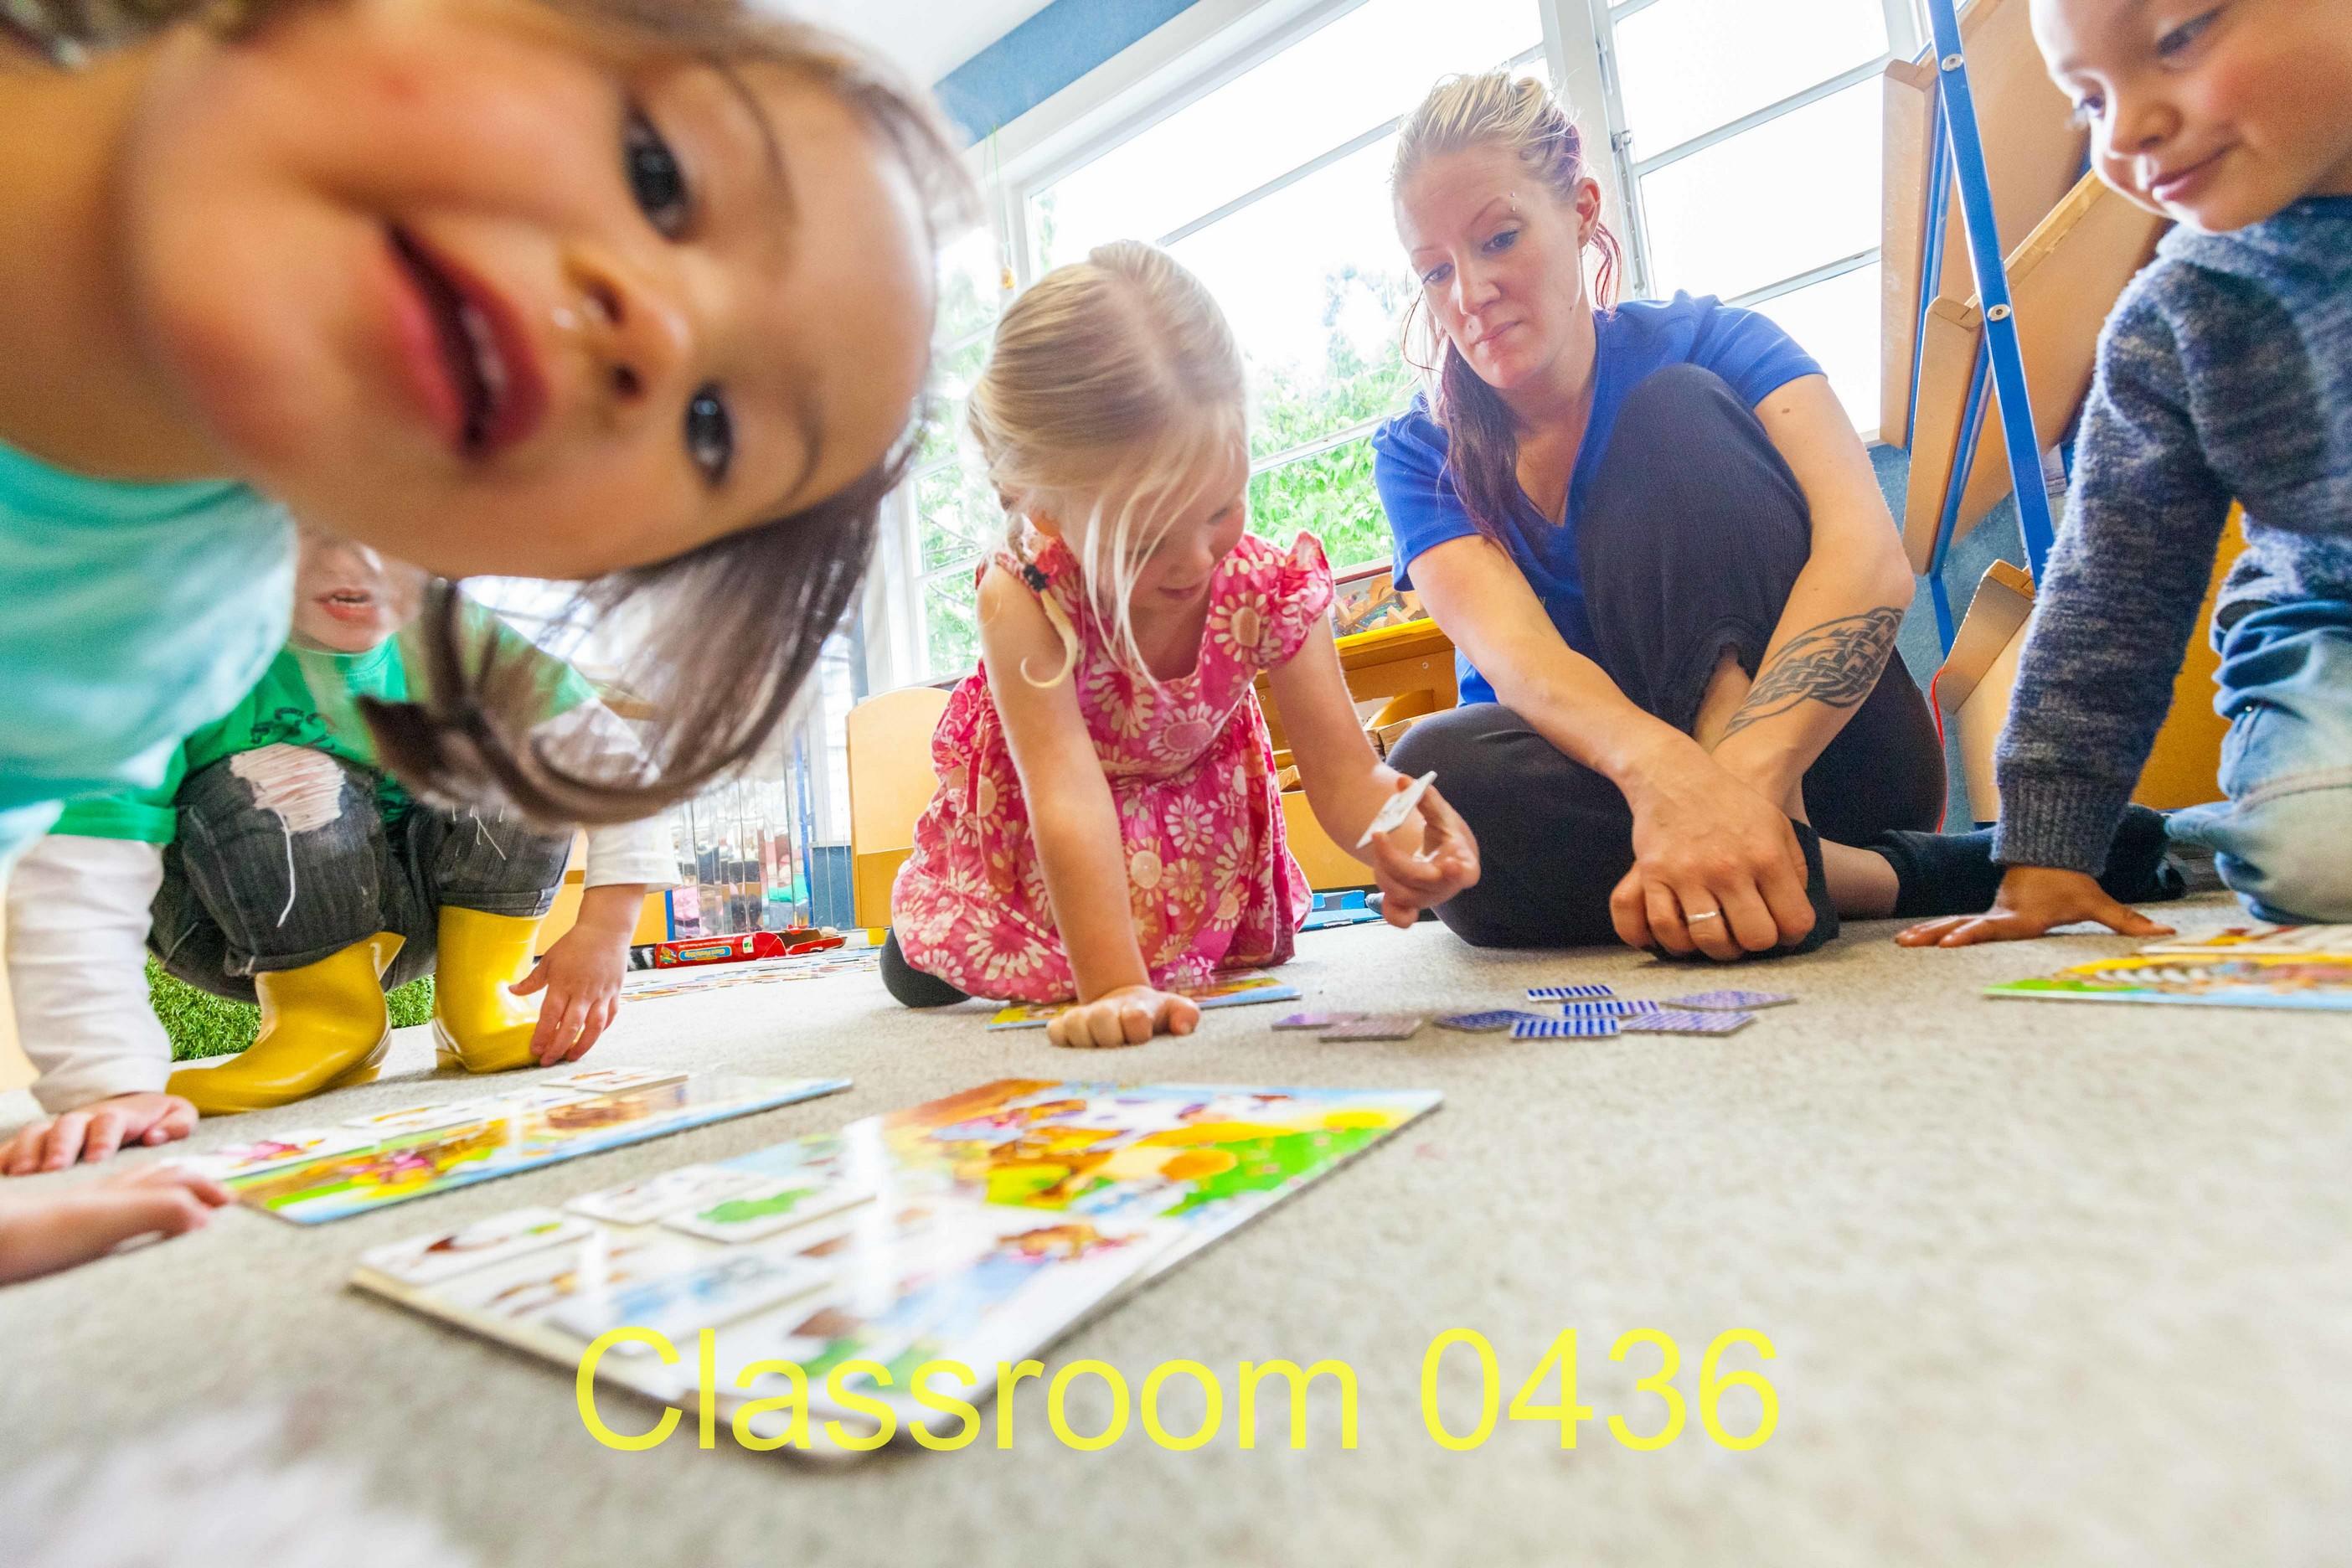 Classroom 0436